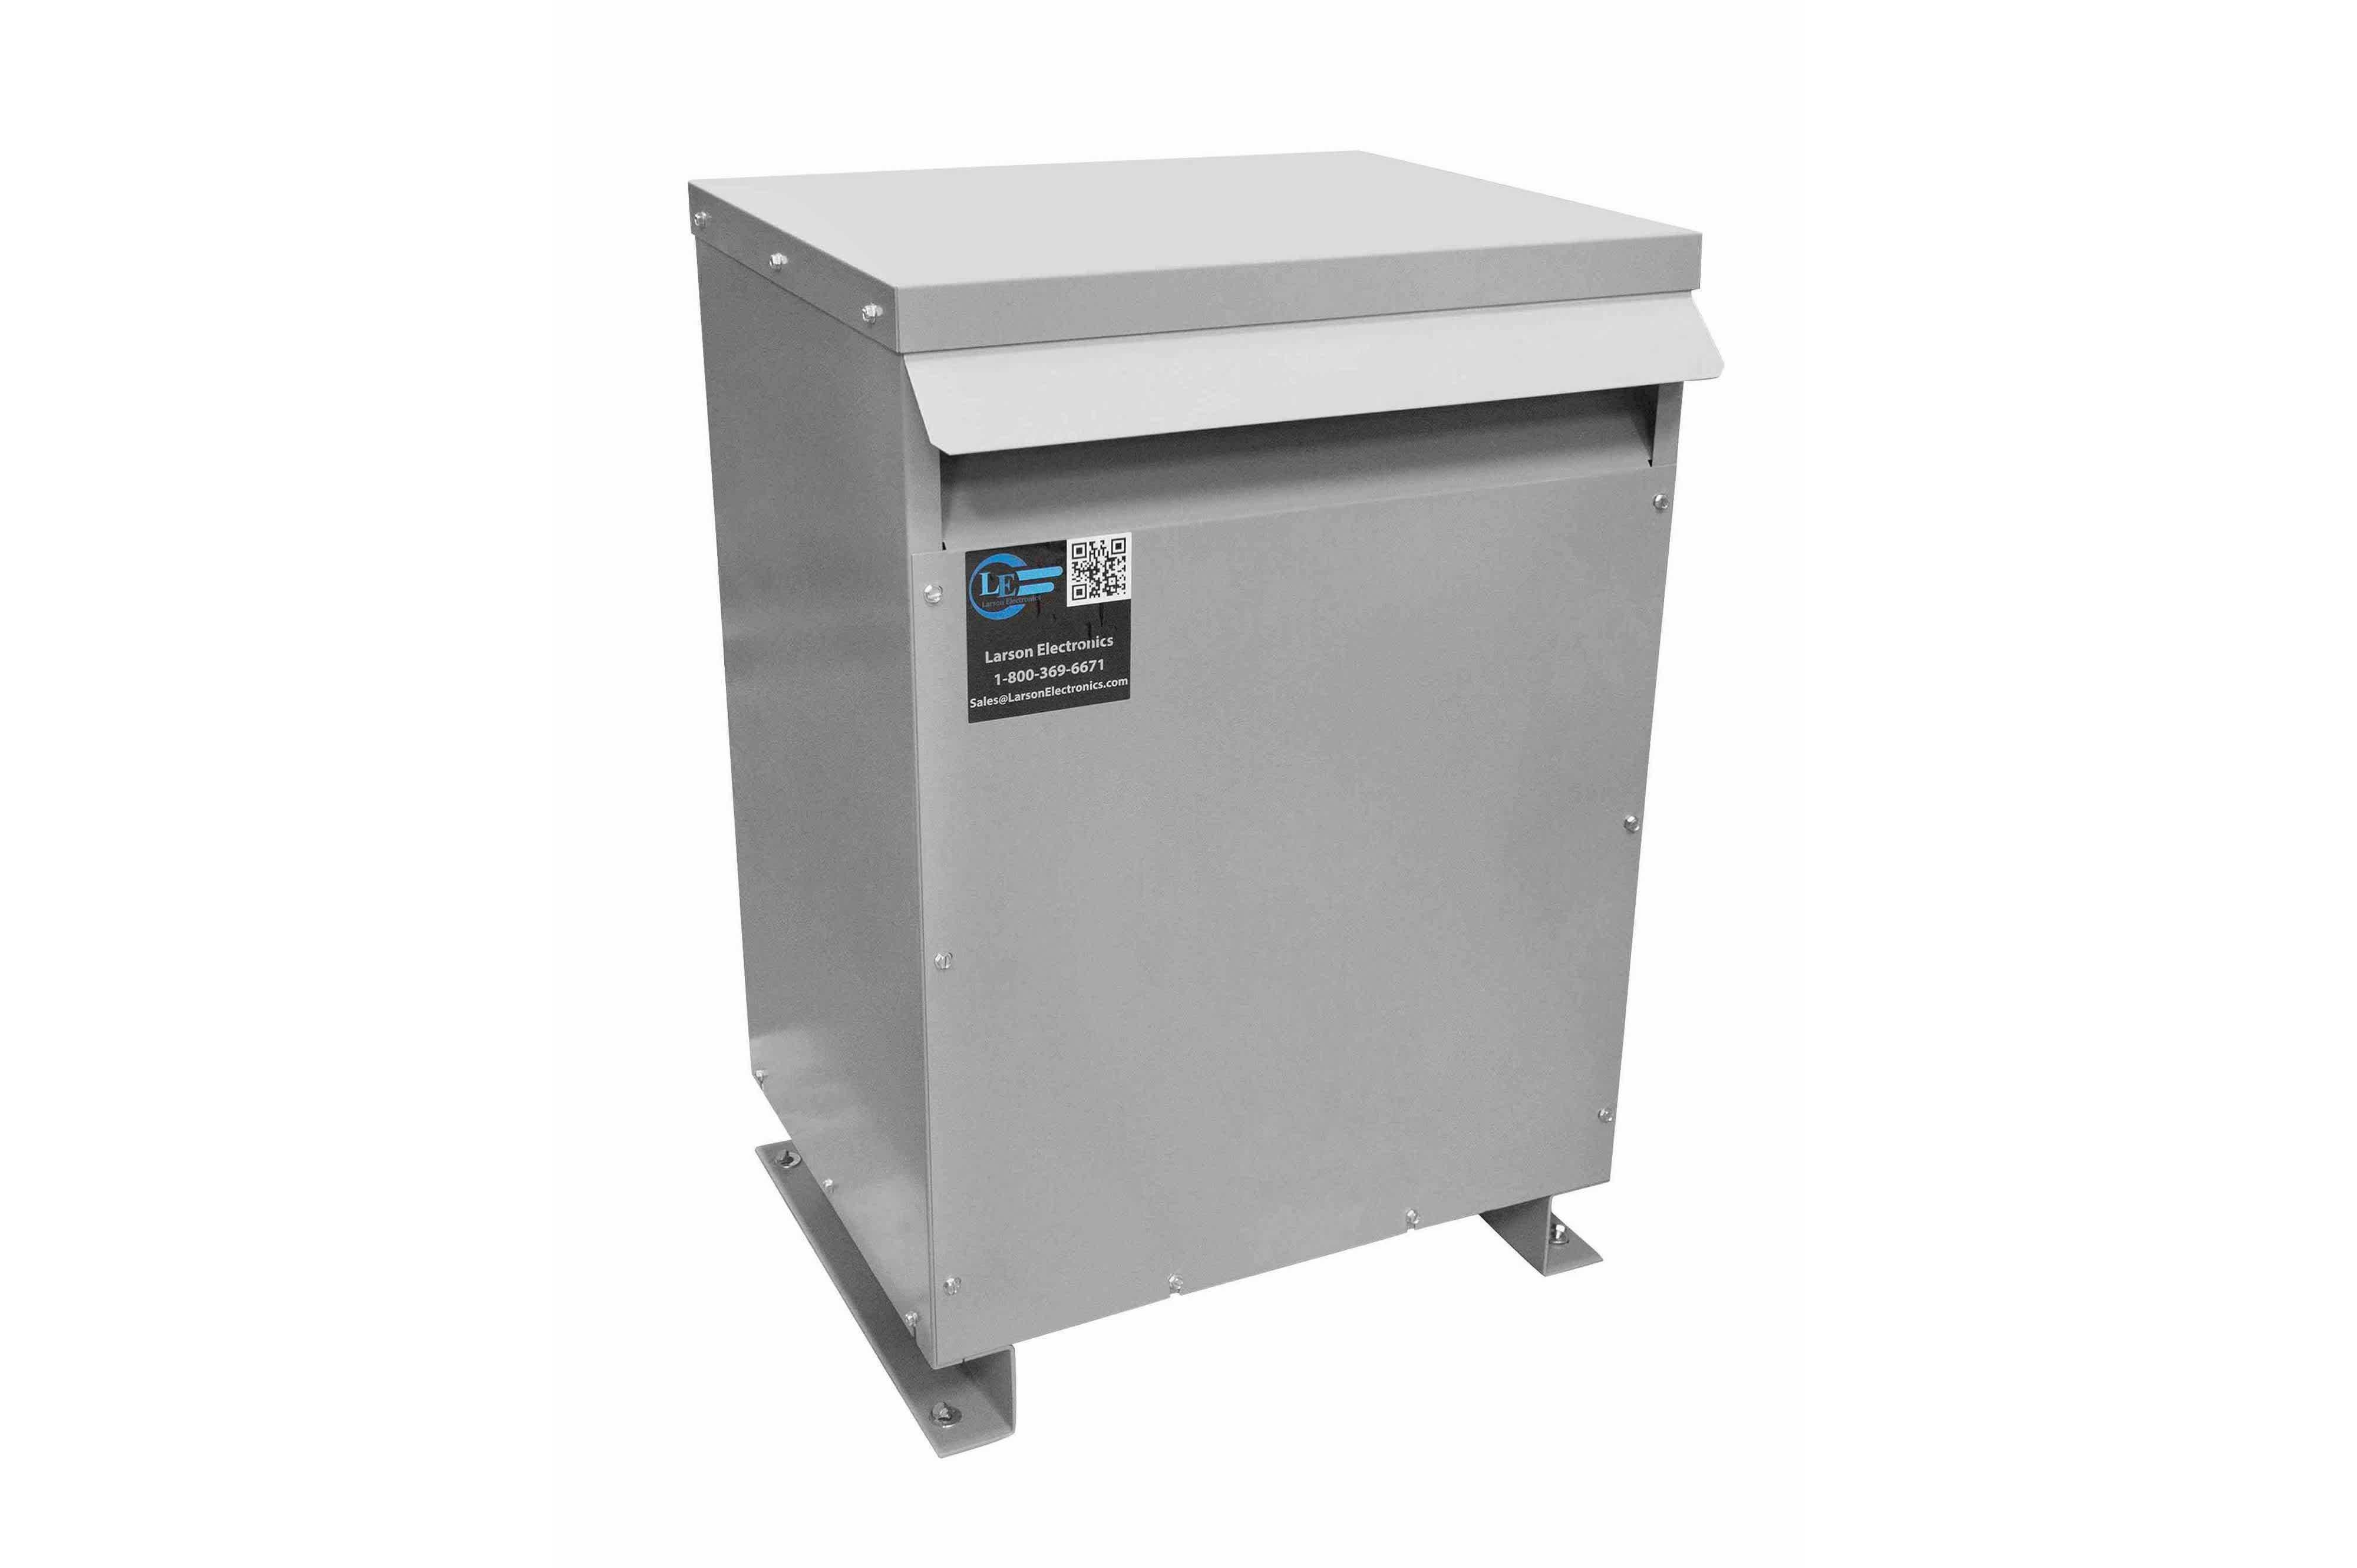 26 kVA 3PH Isolation Transformer, 480V Wye Primary, 208V Delta Secondary, N3R, Ventilated, 60 Hz